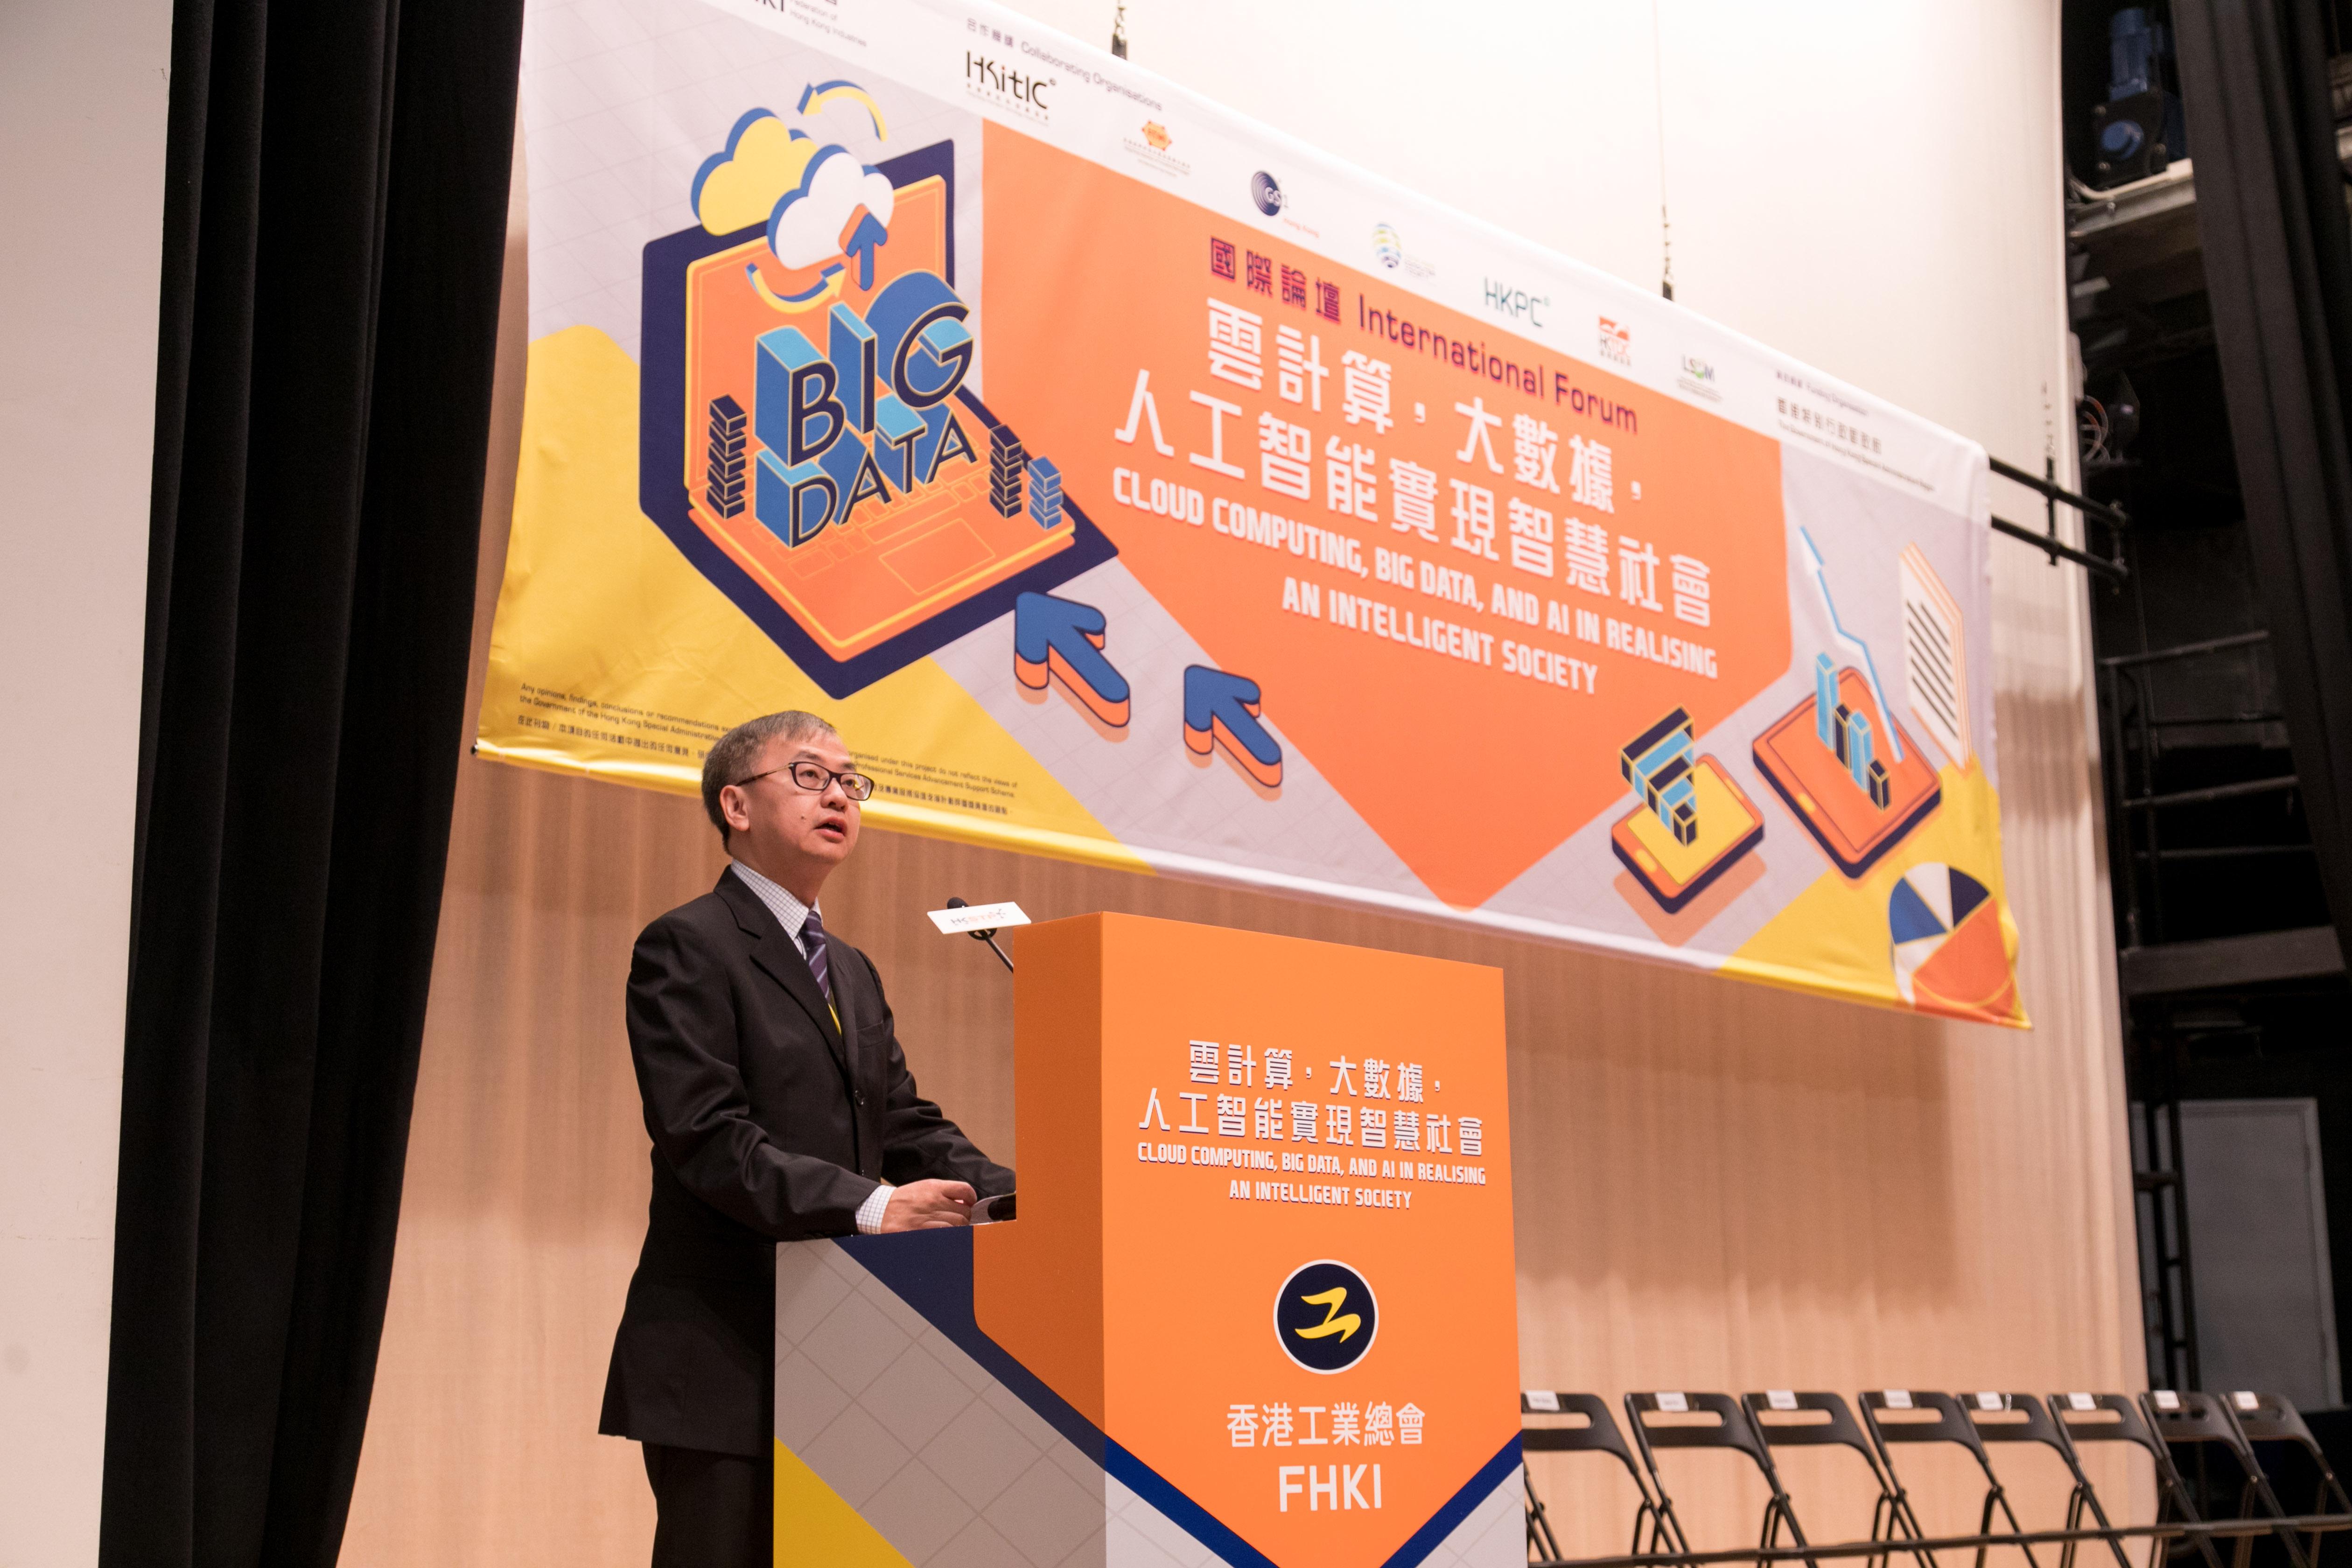 HKITIC   香港工業總會